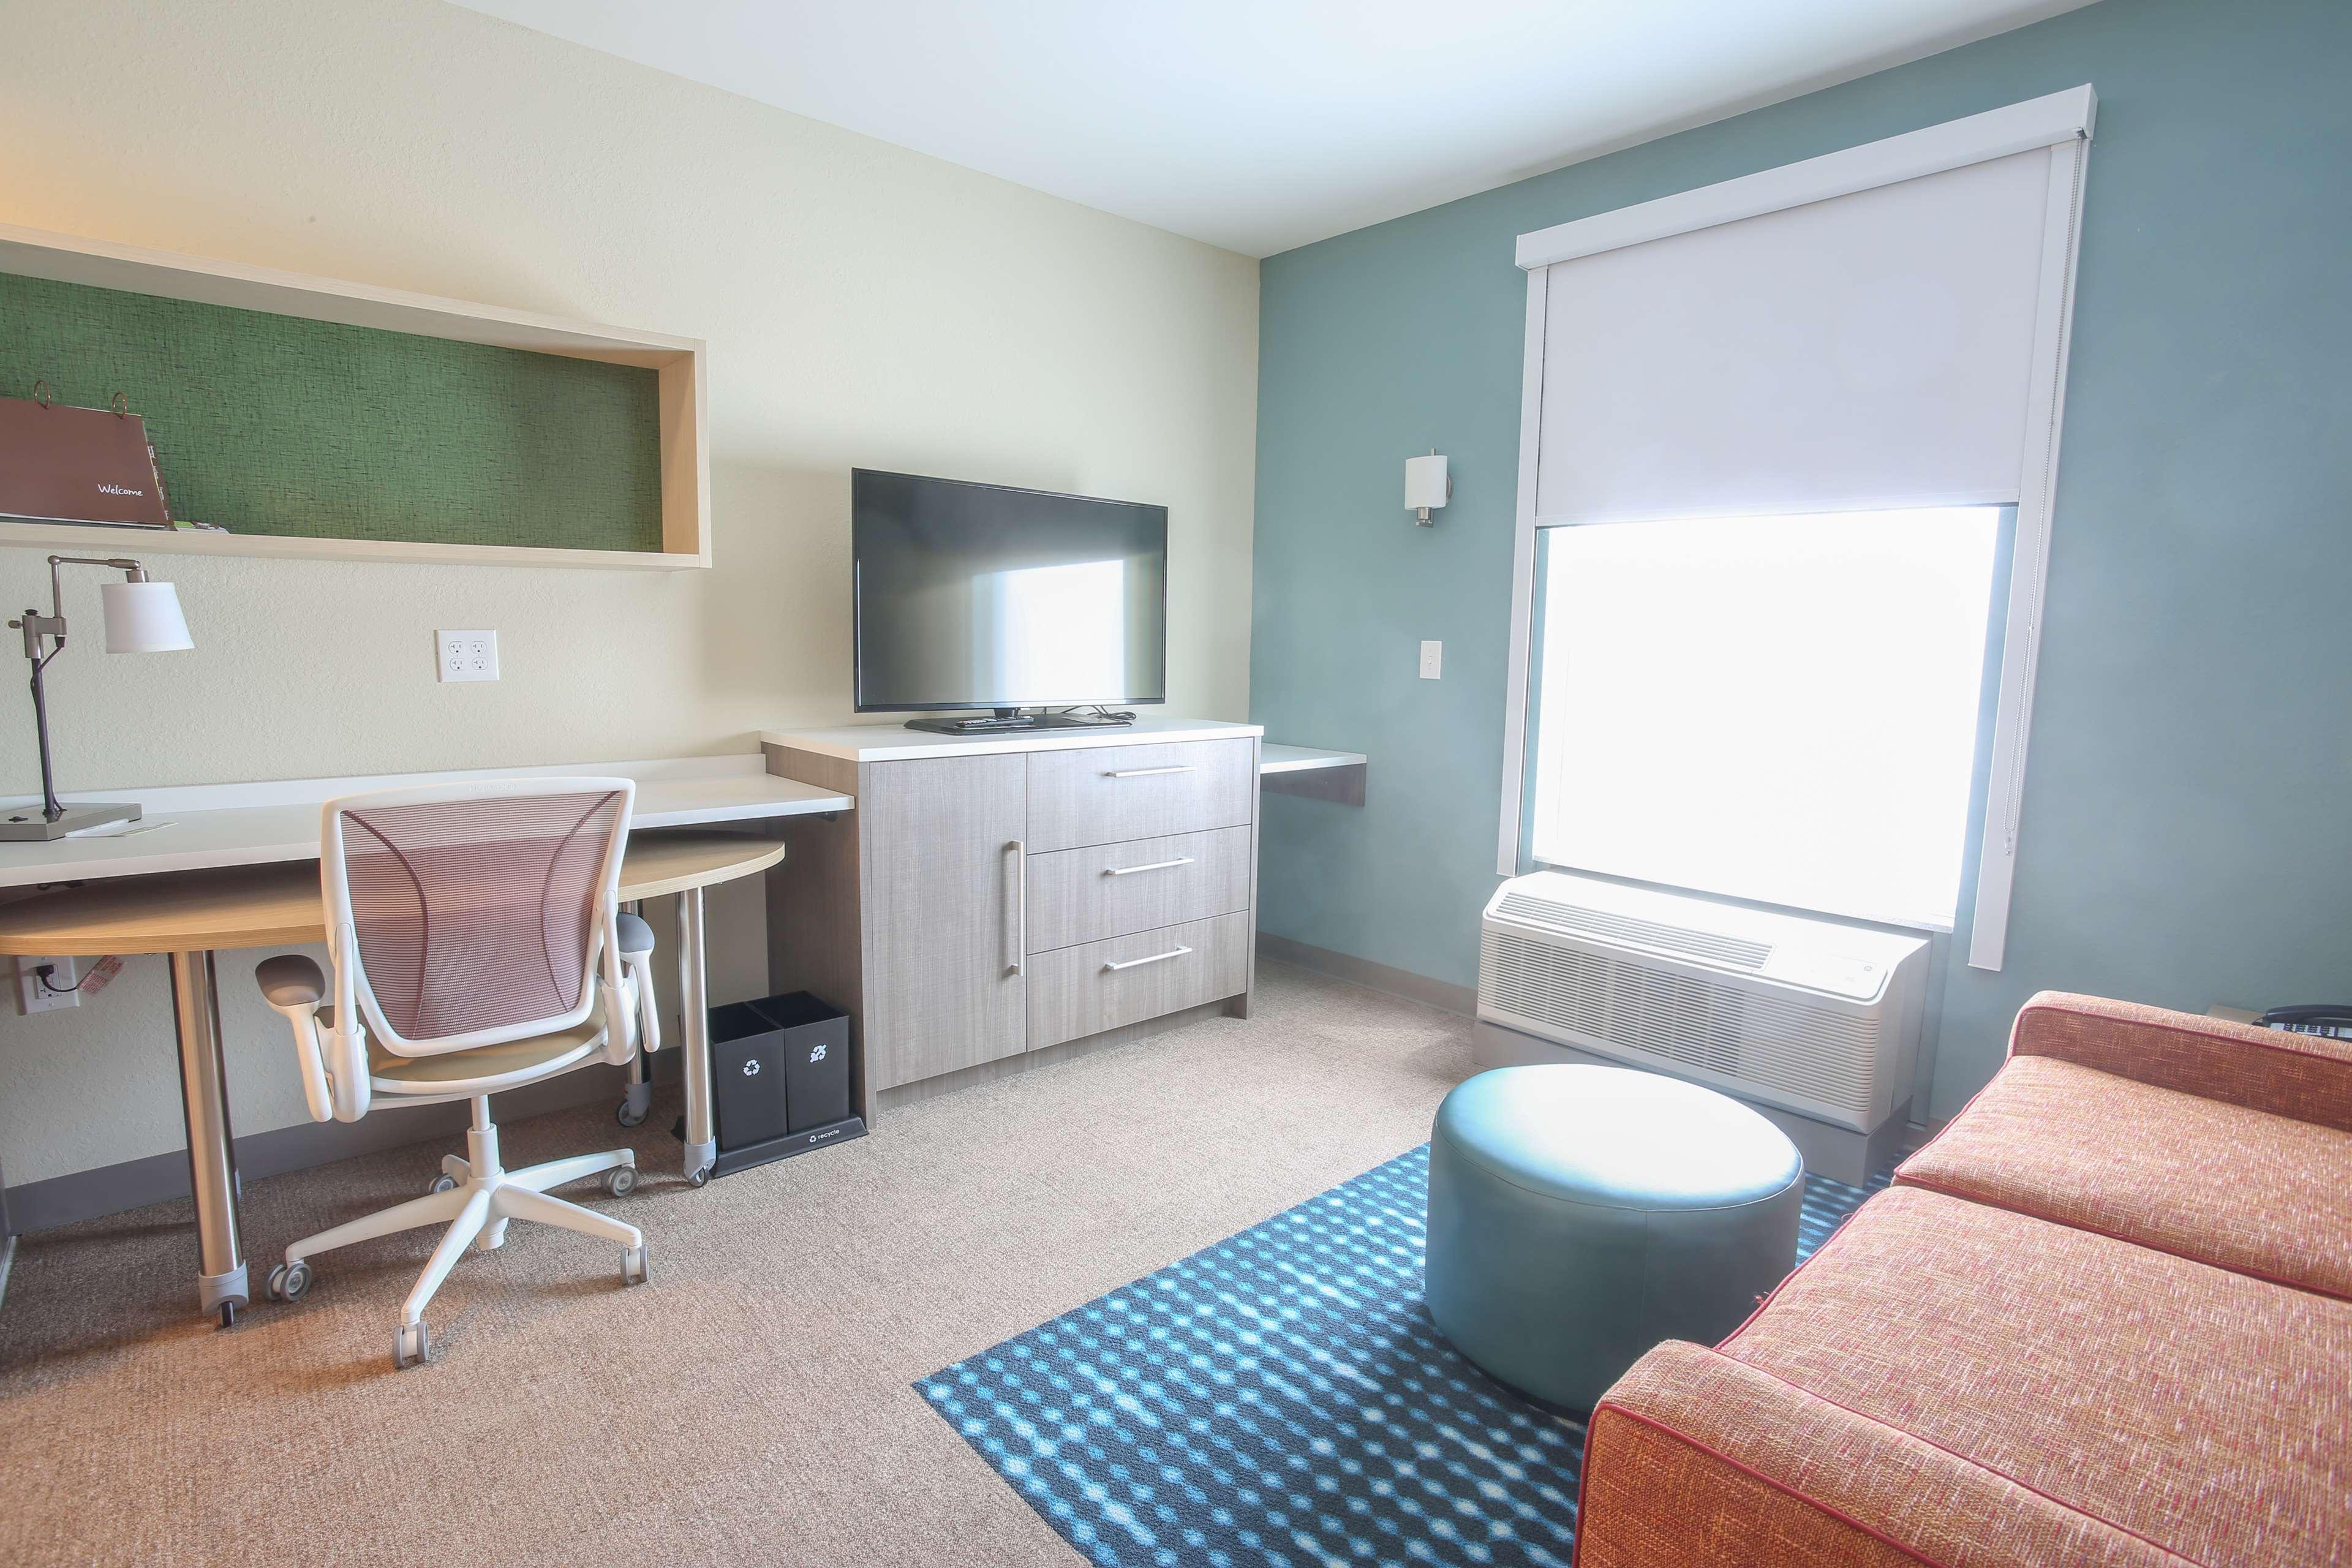 Home2 Suites by Hilton Bordentown image 24